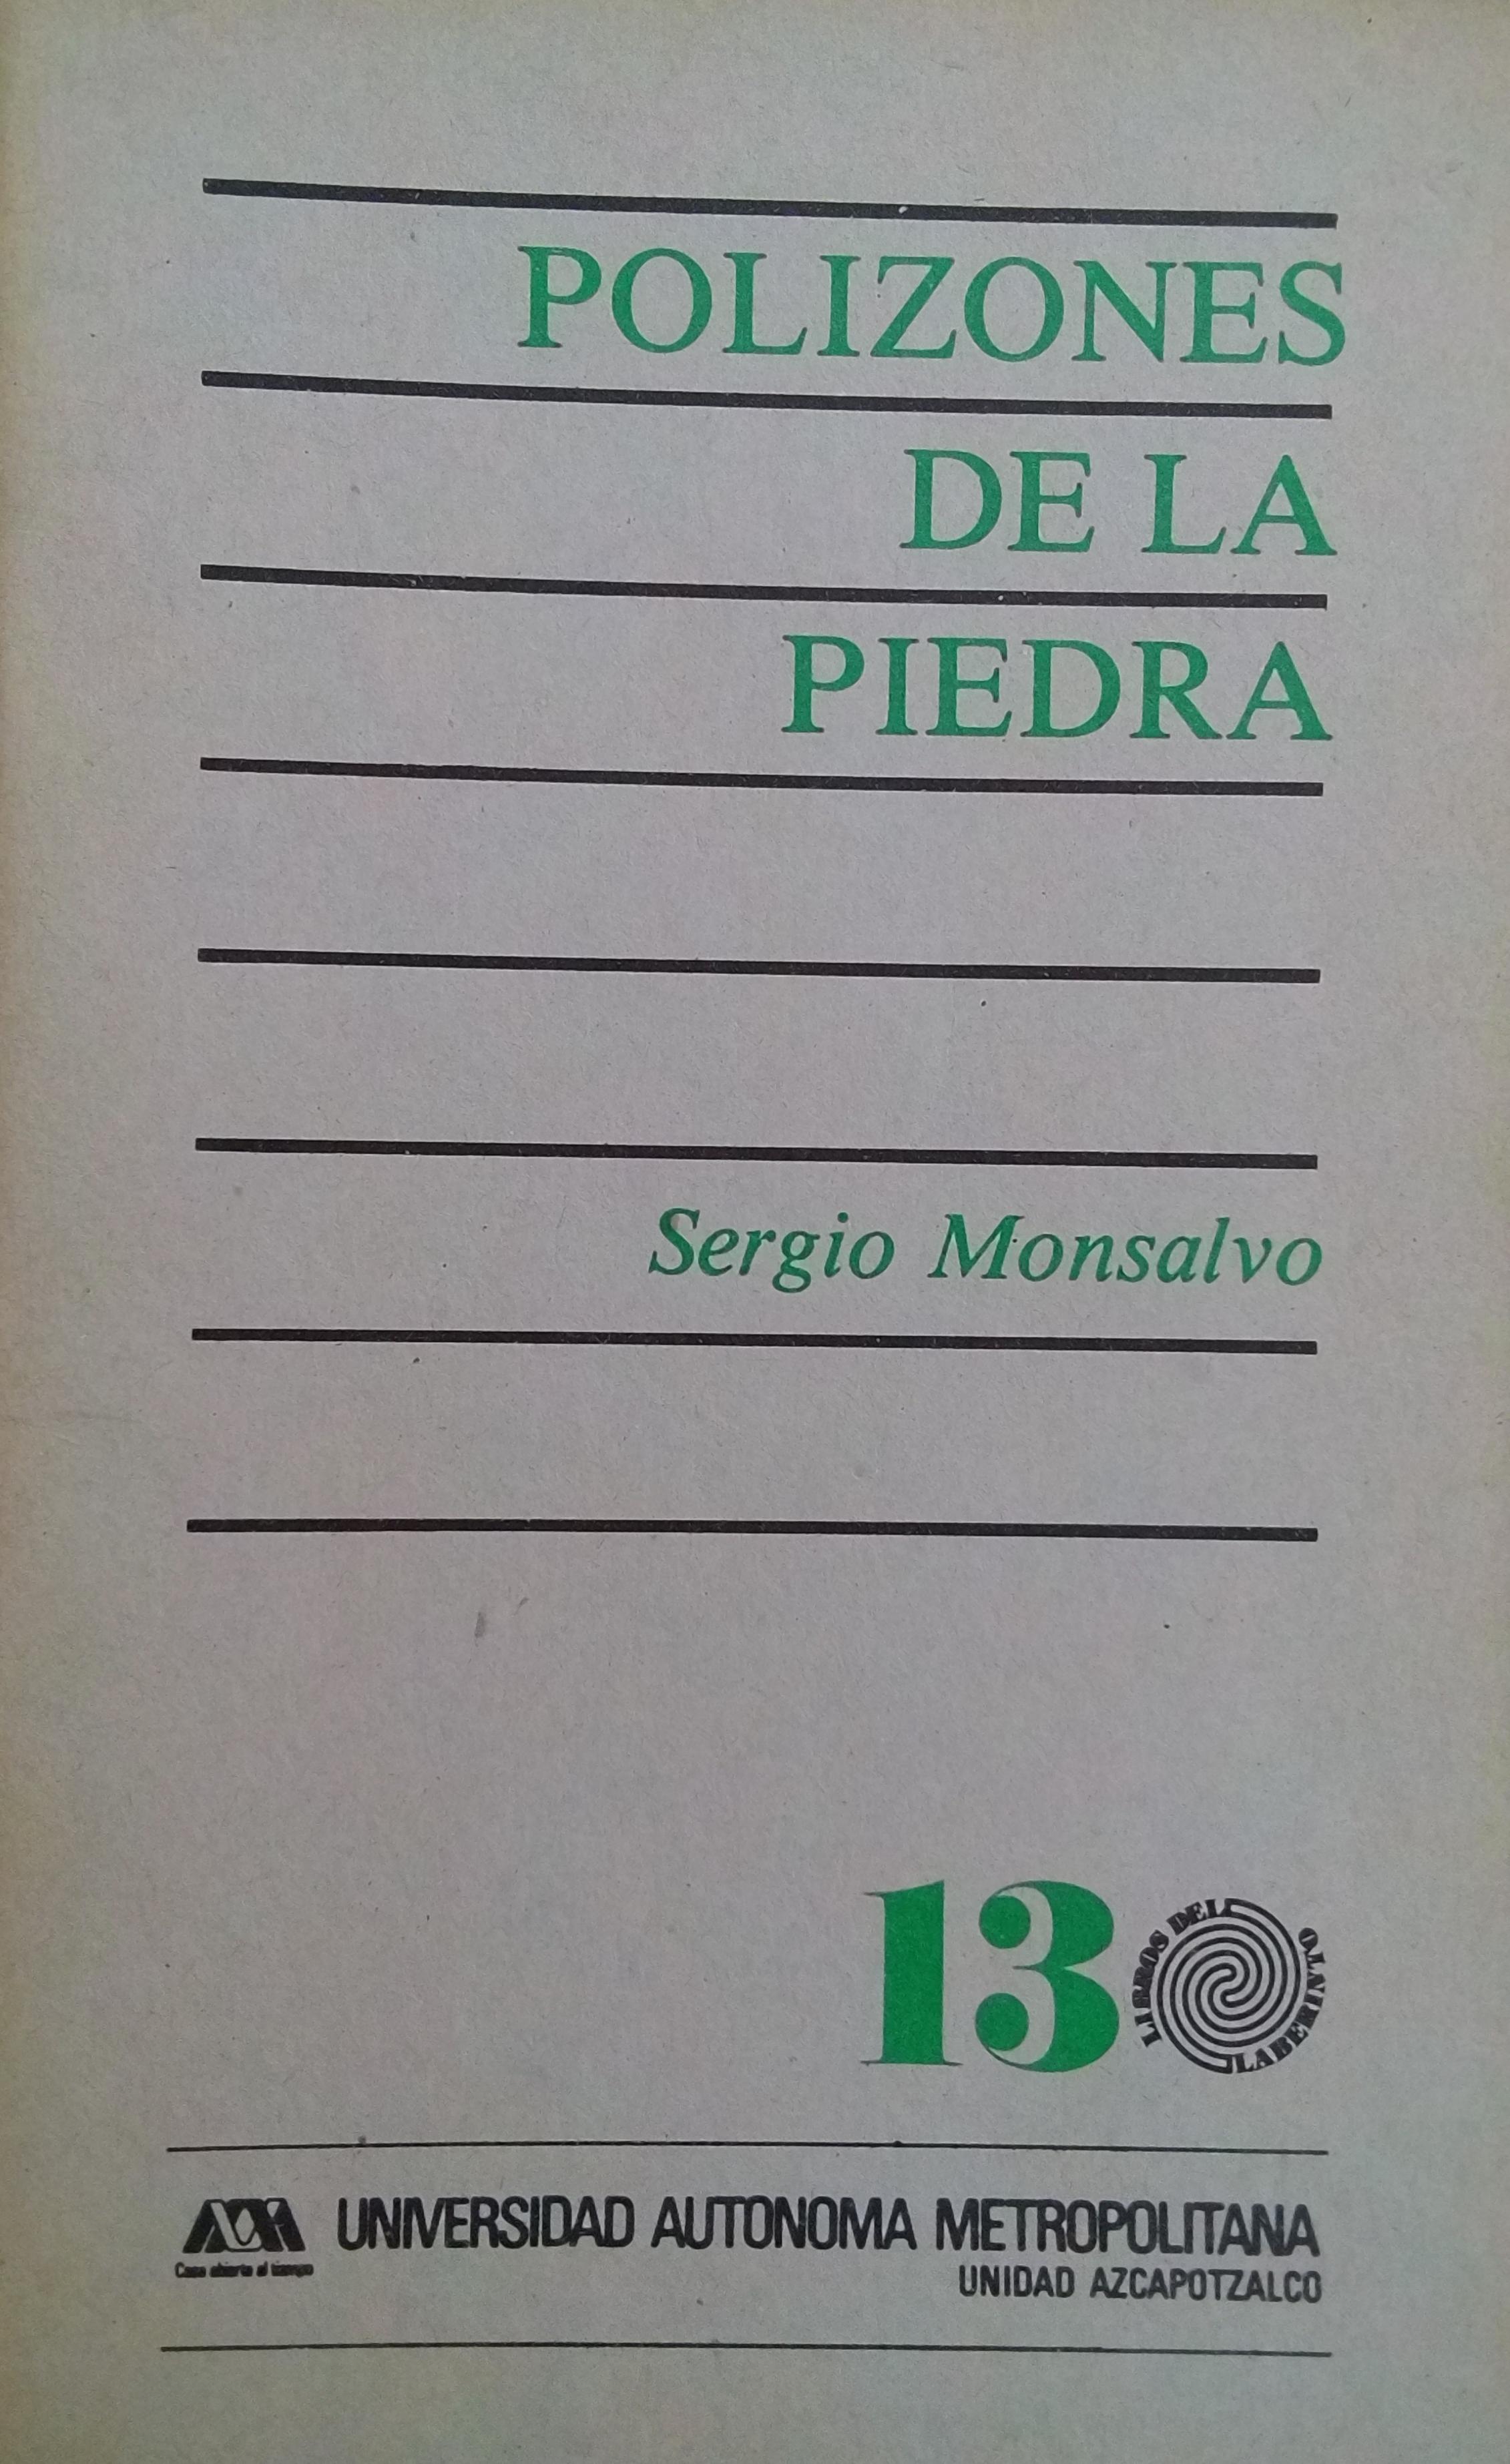 POLIZONES DE LA PIEDRA (FOTO 1)